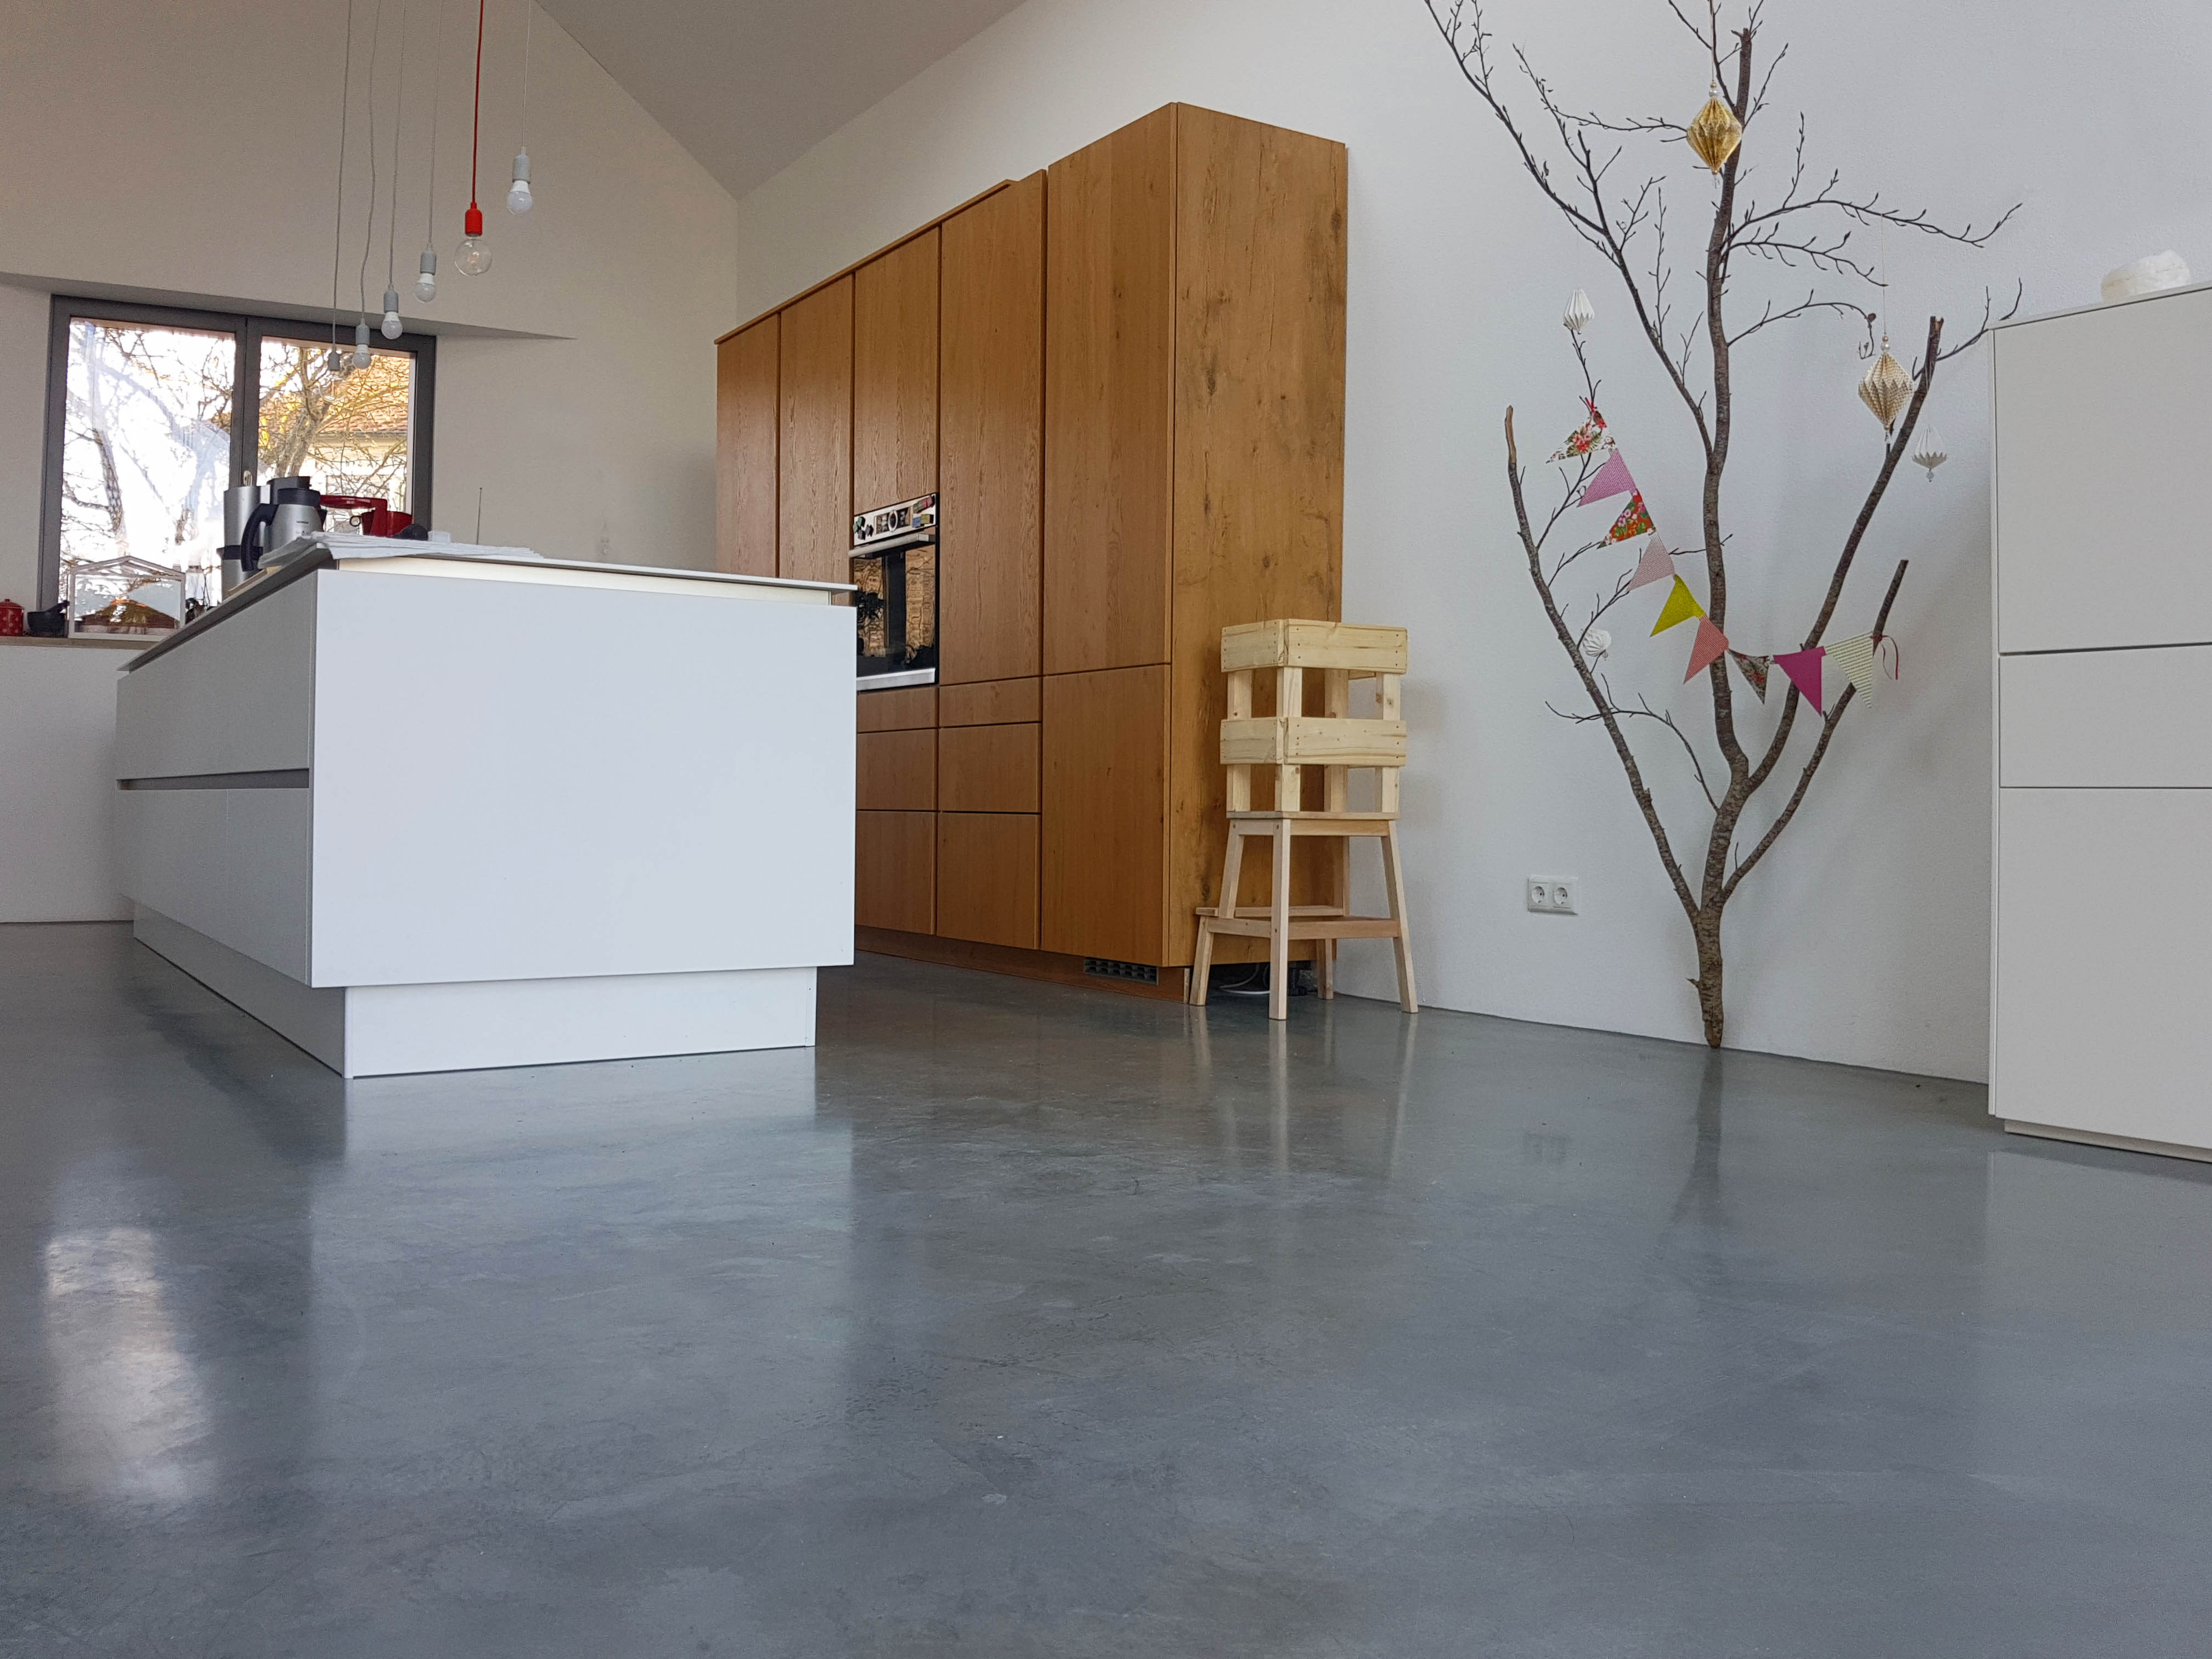 sicht estrich lebkuchen fu bodentechnik gmbh dot agentur. Black Bedroom Furniture Sets. Home Design Ideas